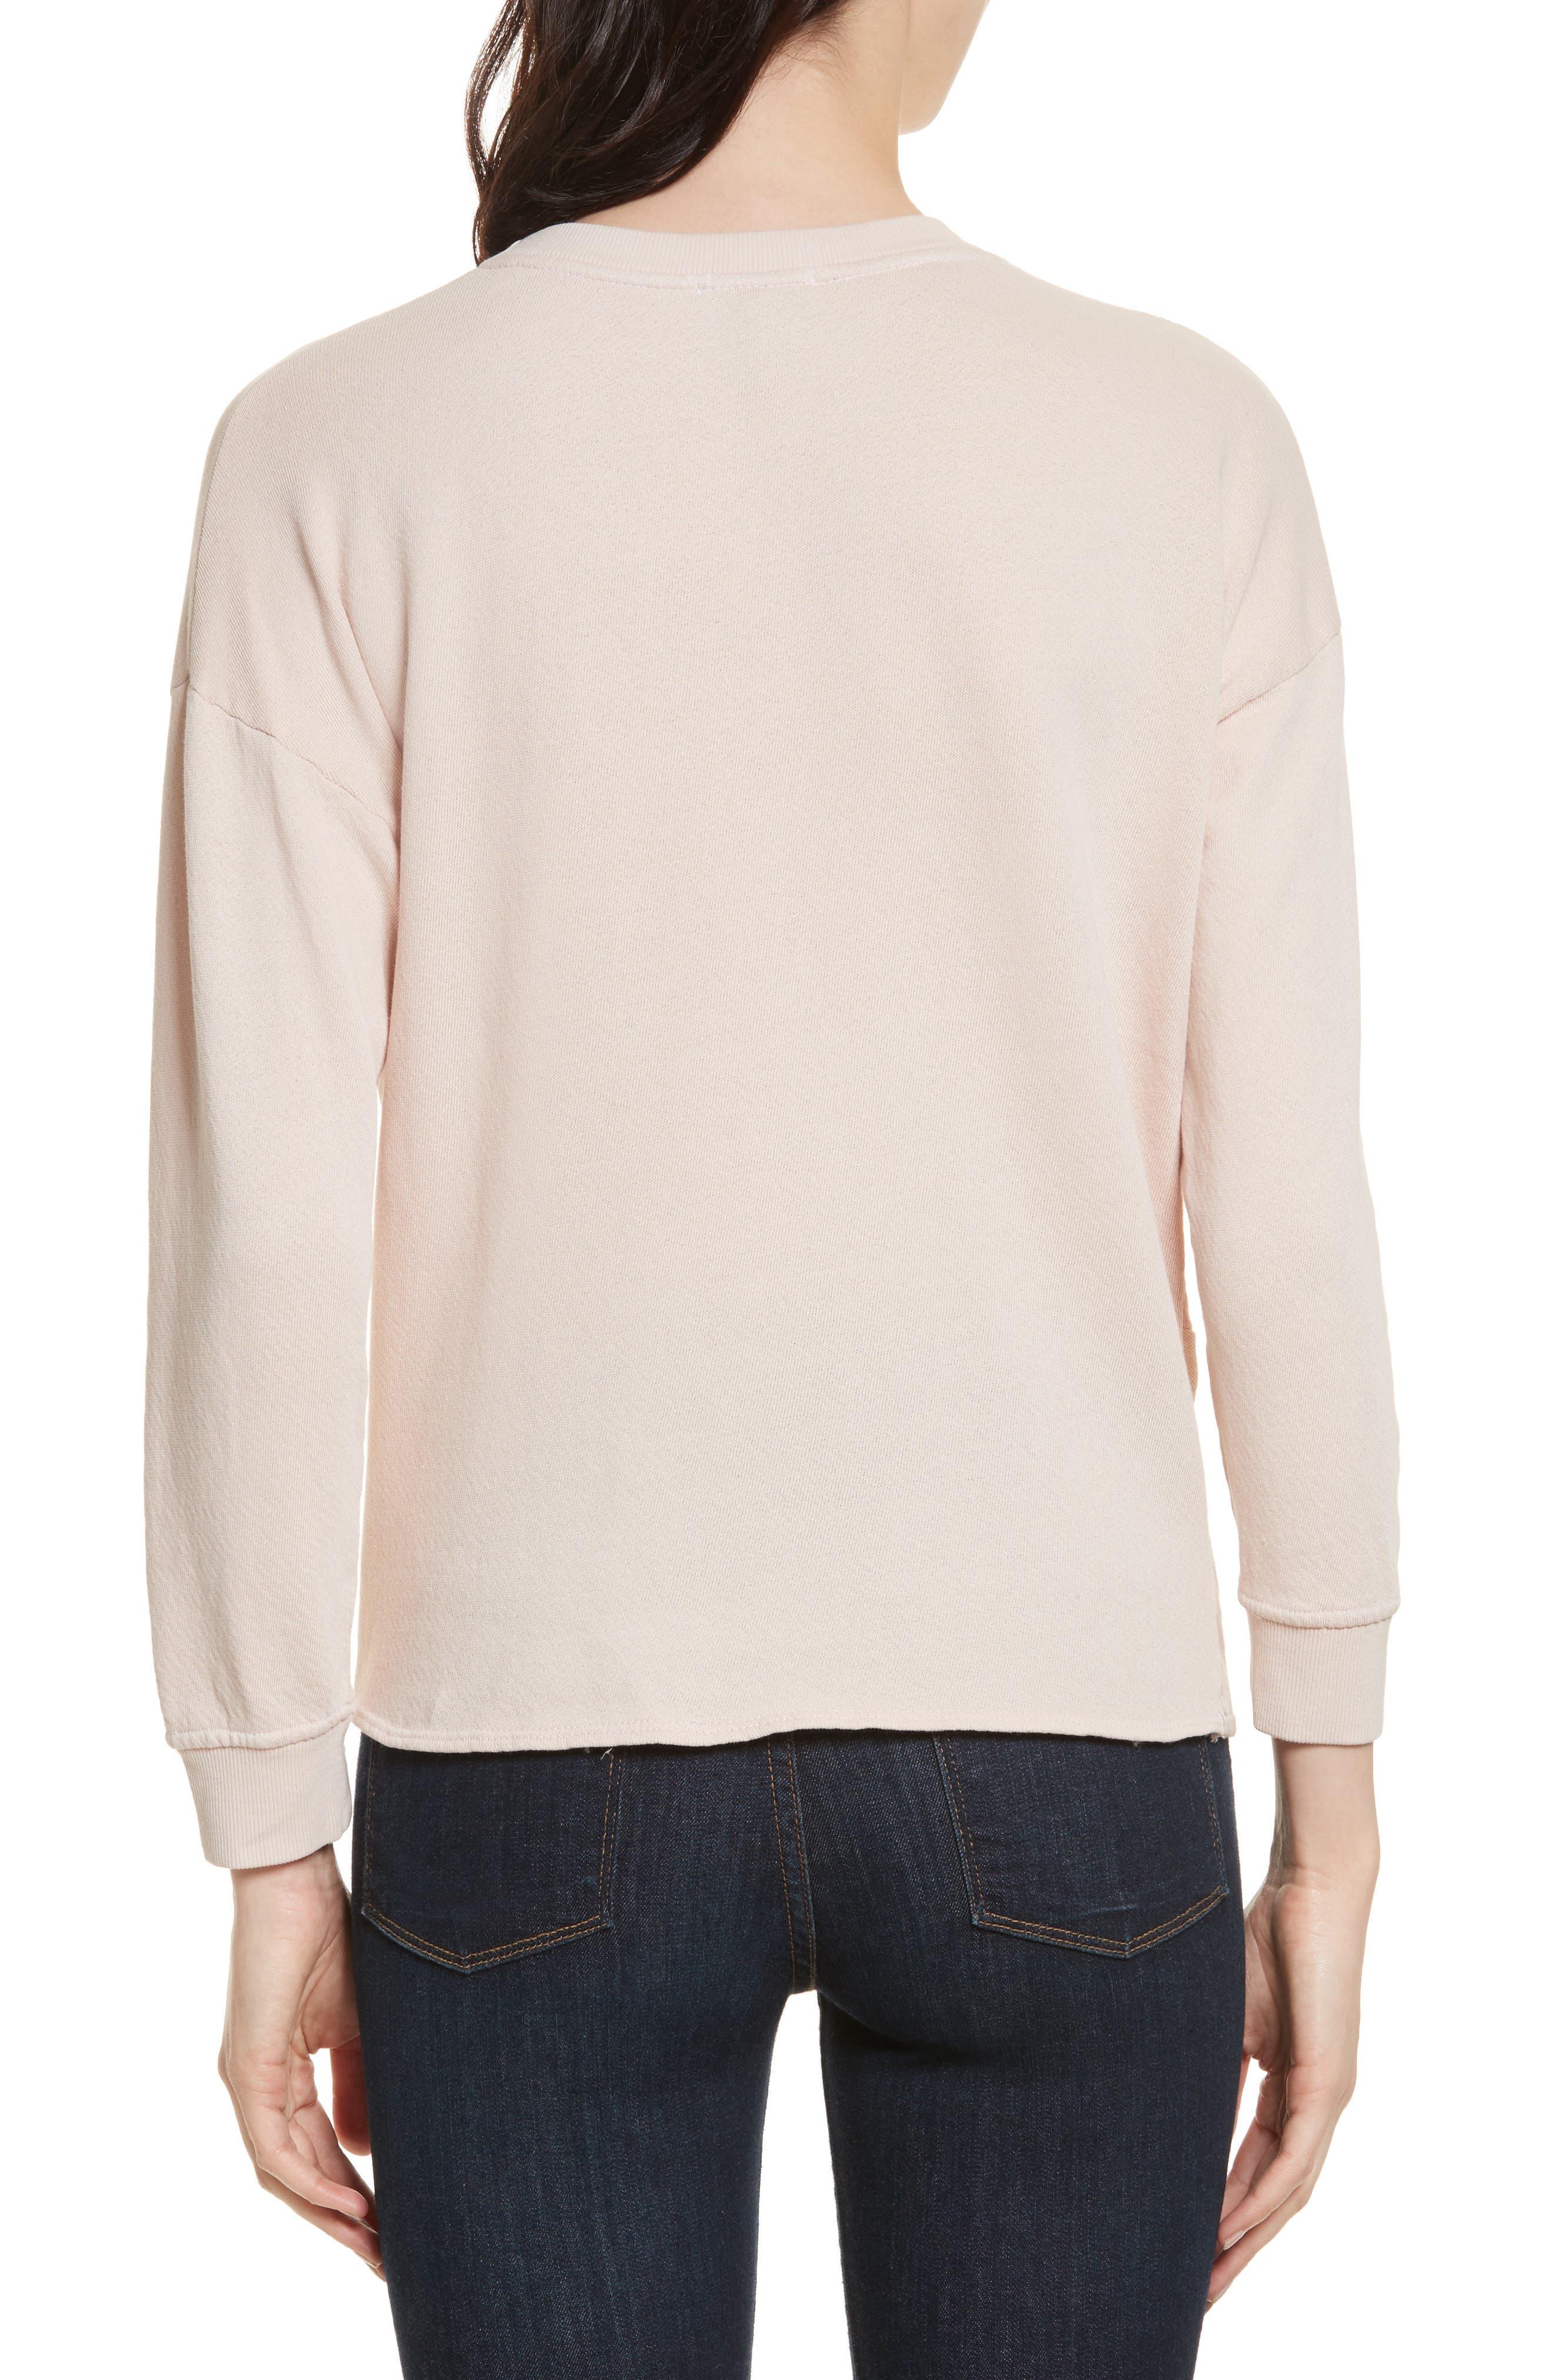 Nazani Twist Front Sweatshirt,                             Alternate thumbnail 2, color,                             687